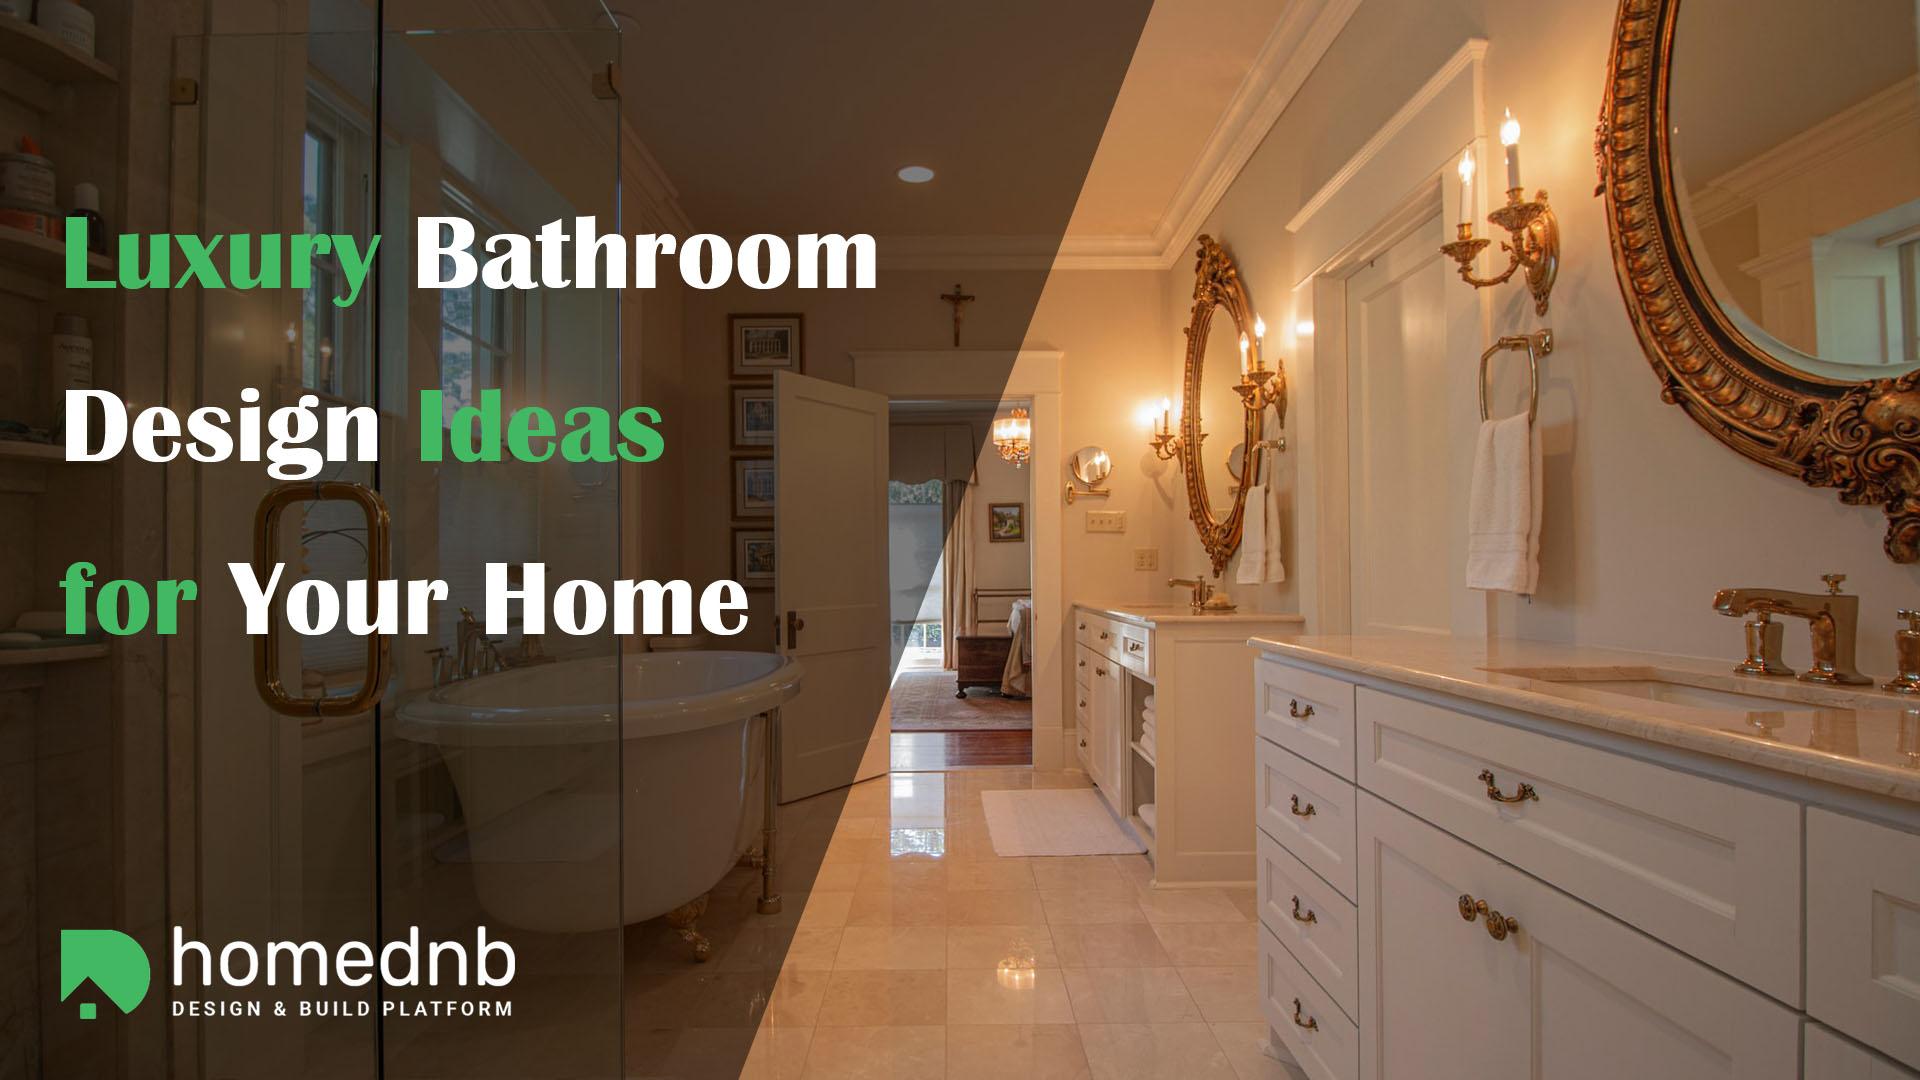 Luxury Bathroom Design Ideas for Your Home